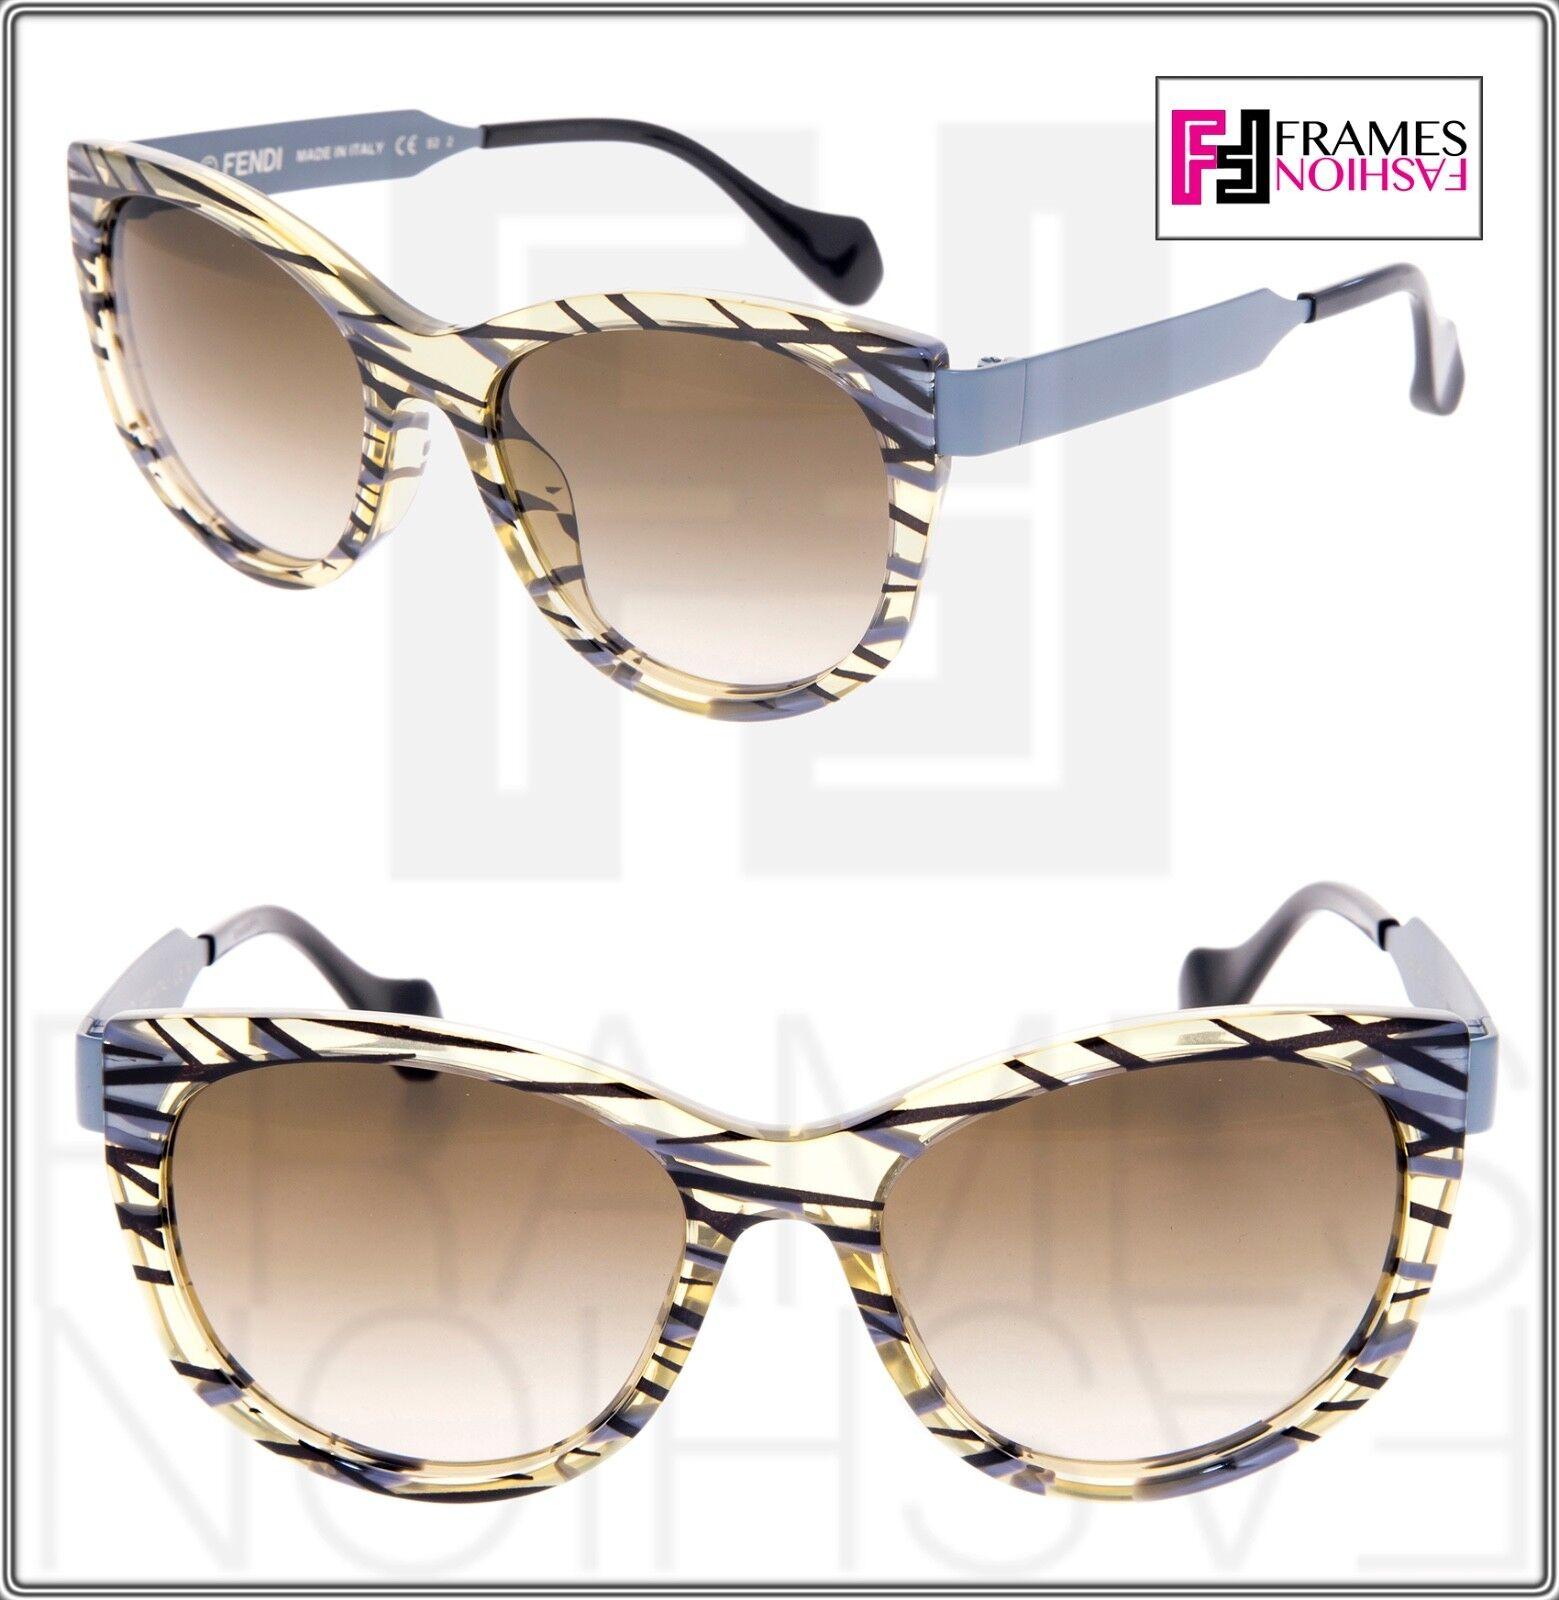 FENDI Thierry Lasry SLIKY FF0181S Matte Grey Ochre Black Metal Sunglasses 0181